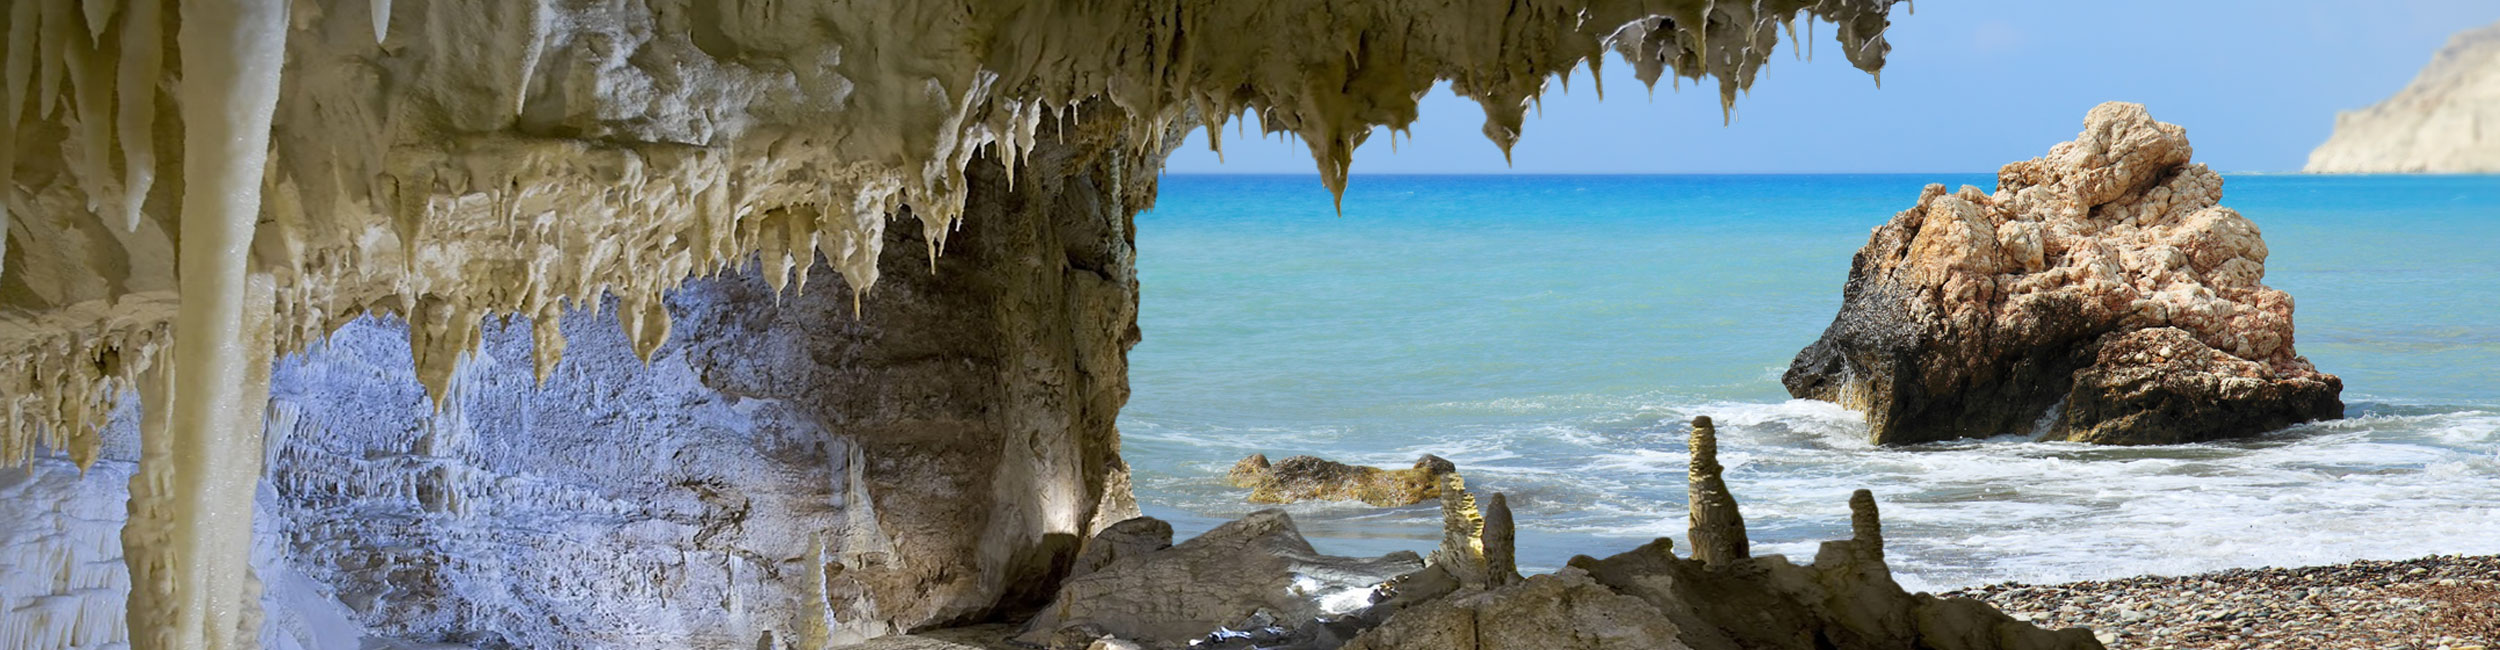 Halos Grotta del Sale